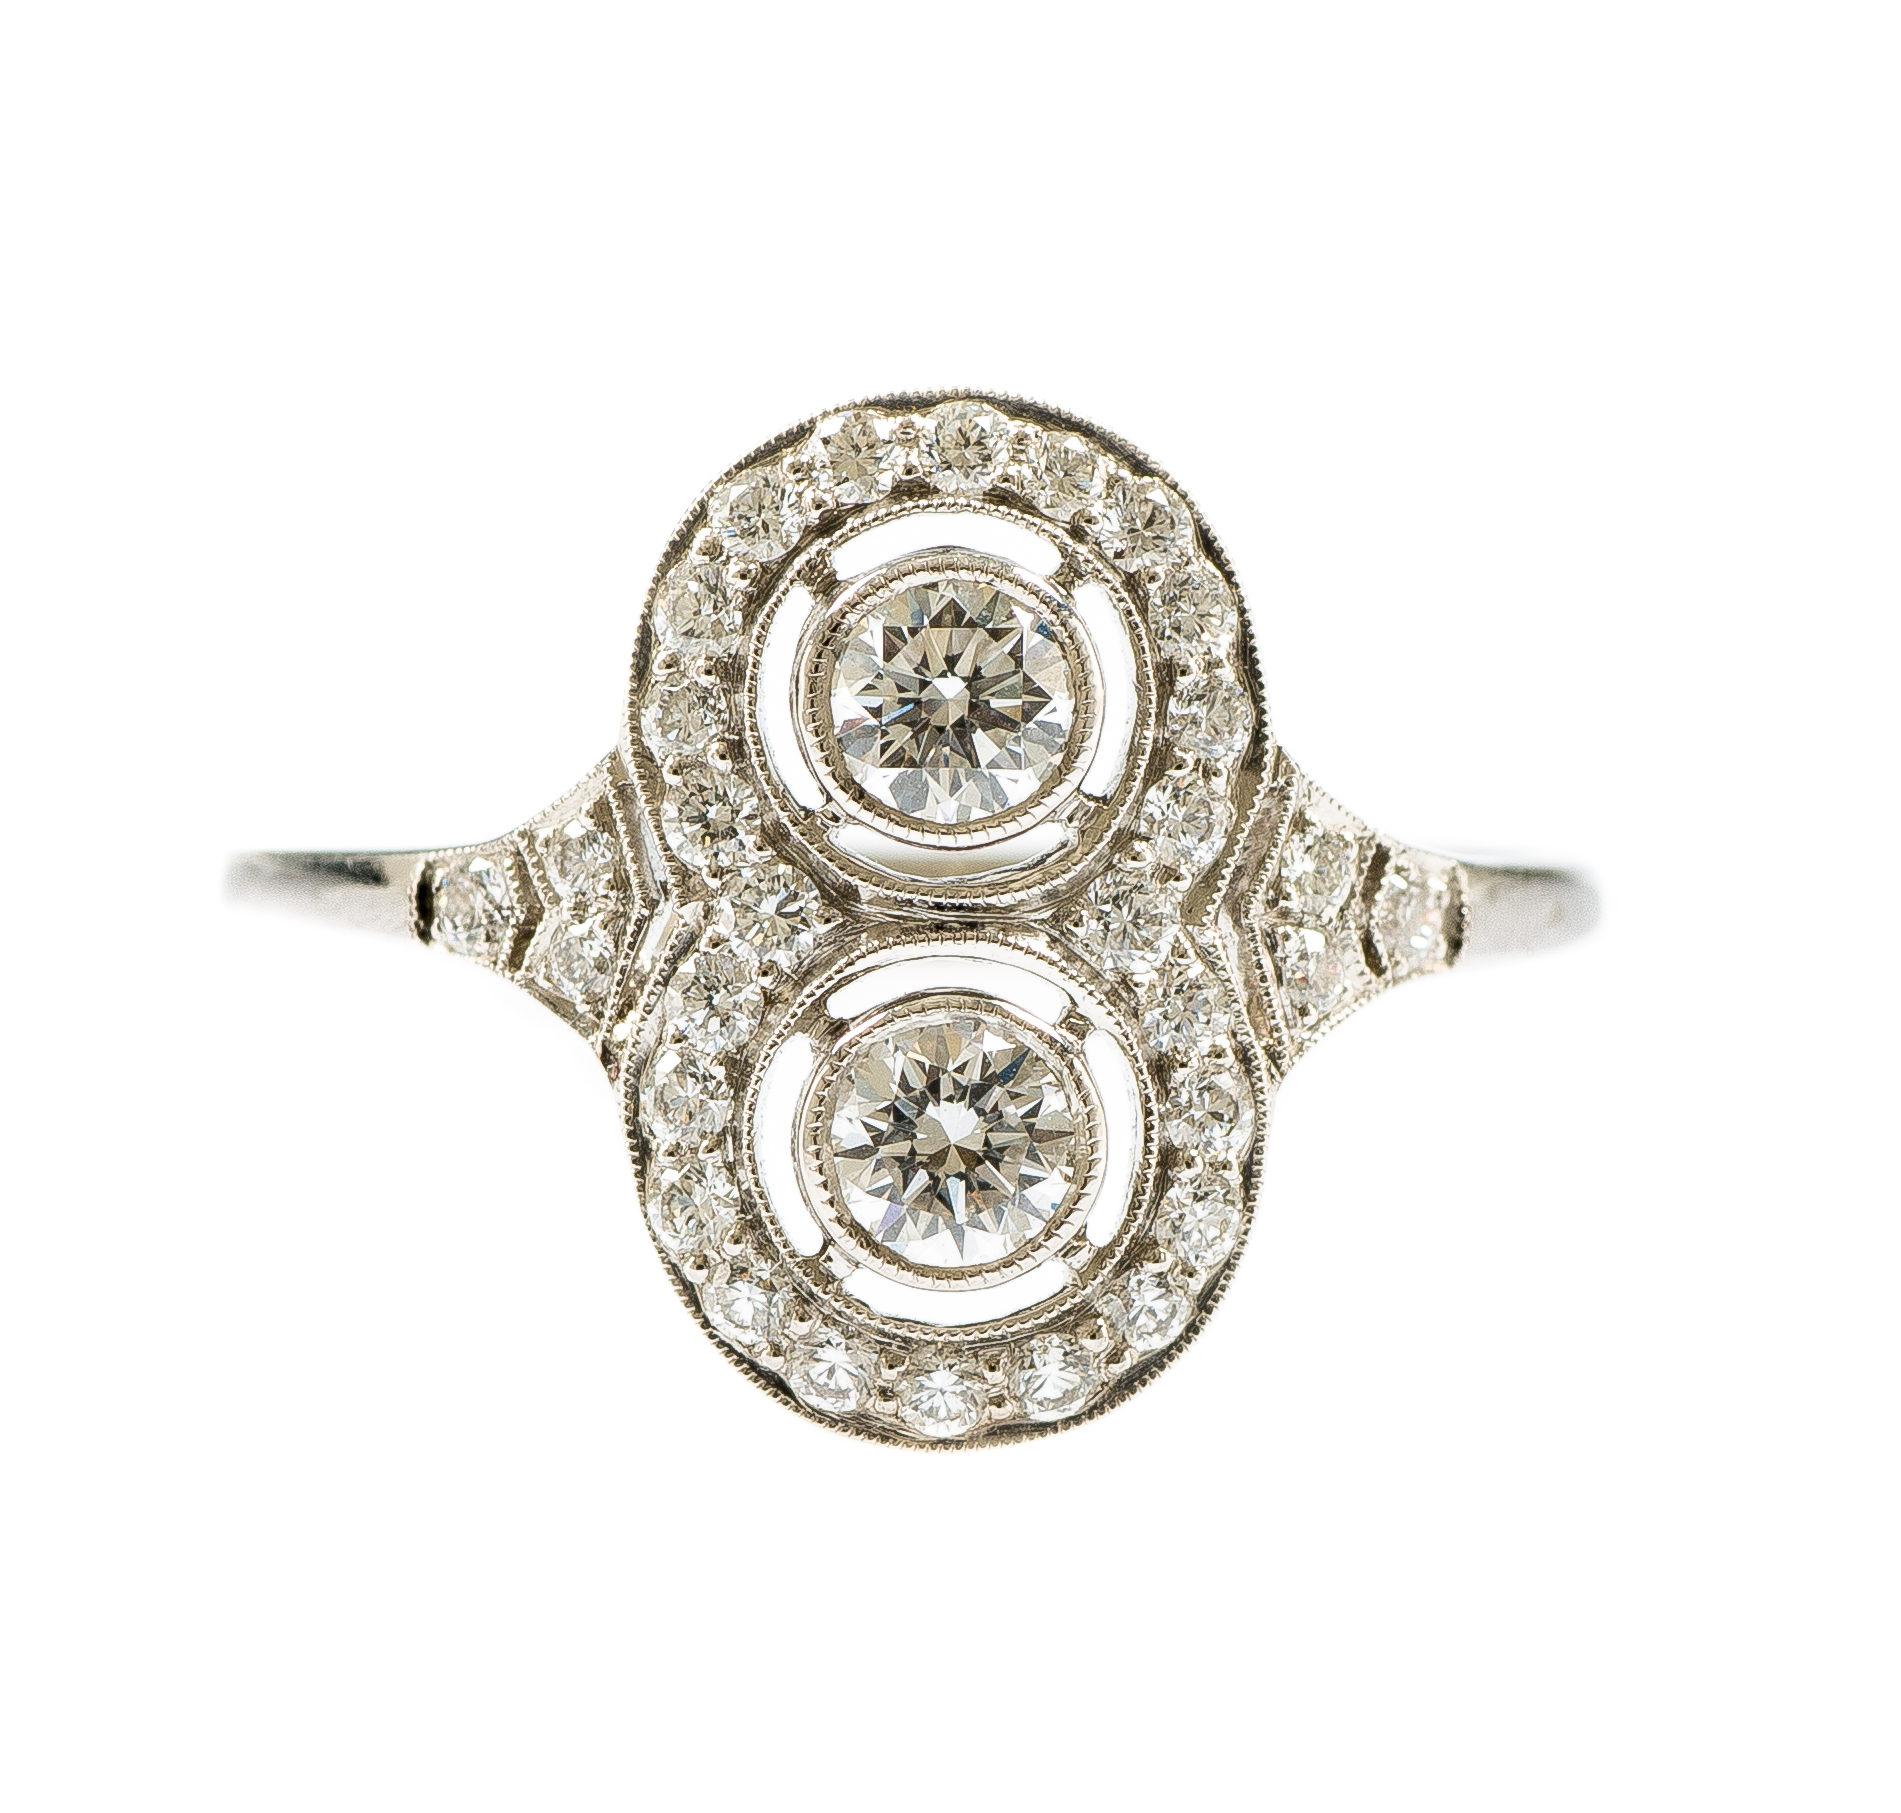 Platinum Diamond Art Deco Style Ring Fosters Jewellers